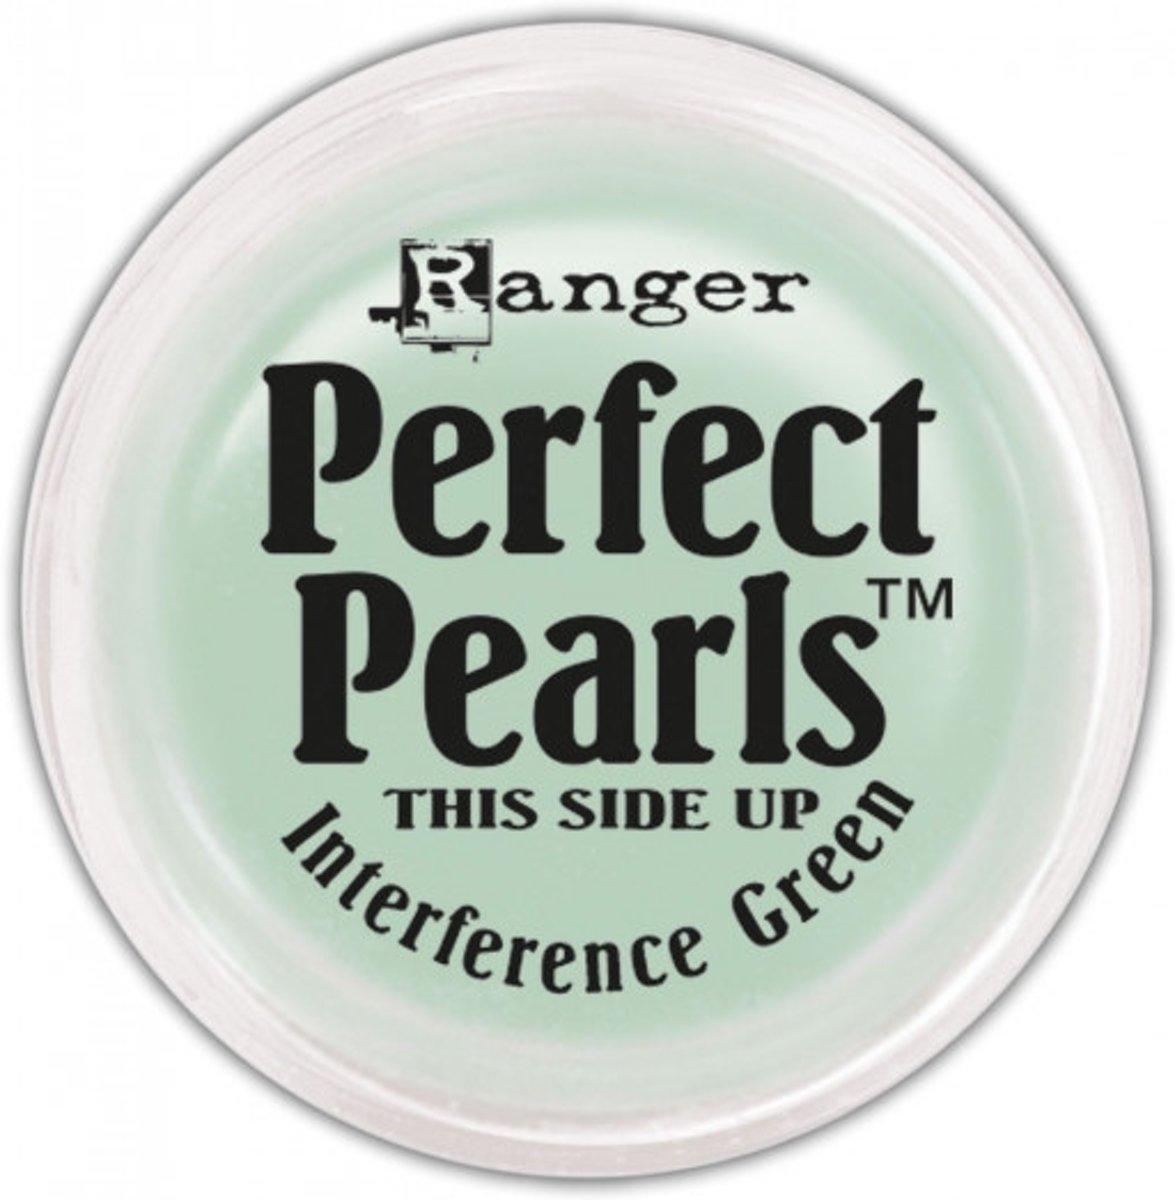 Afbeelding van product Pigment jars interference green